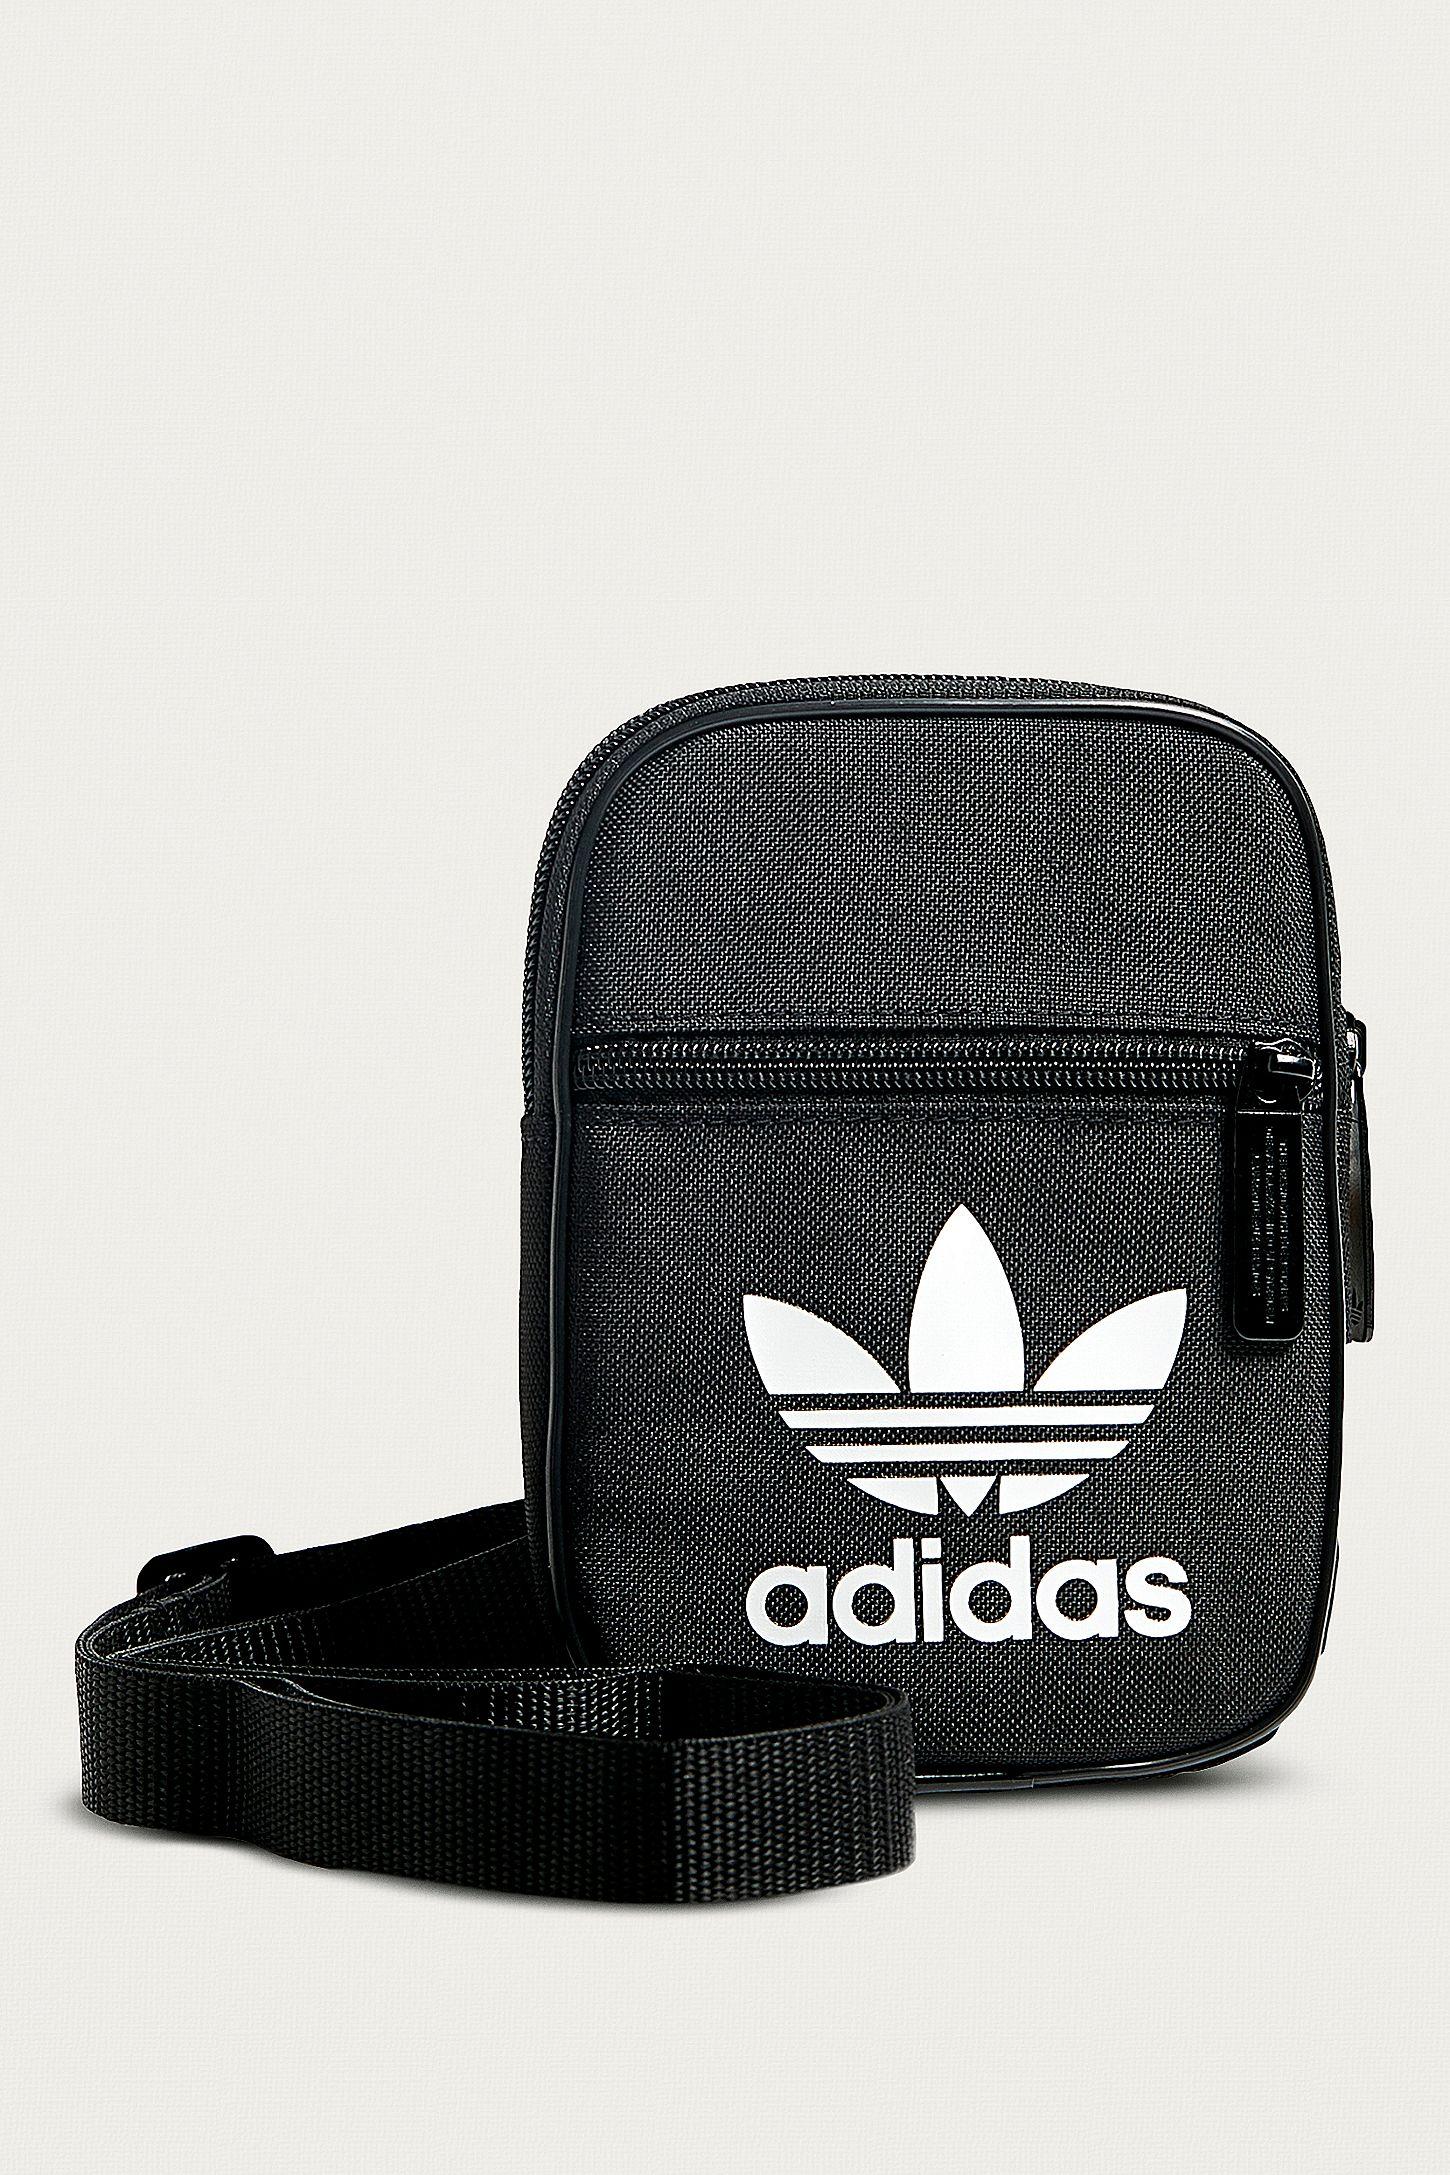 adidas Originals Trefoil Festival Crossbody   Urban Outfitters UK 992233eebd